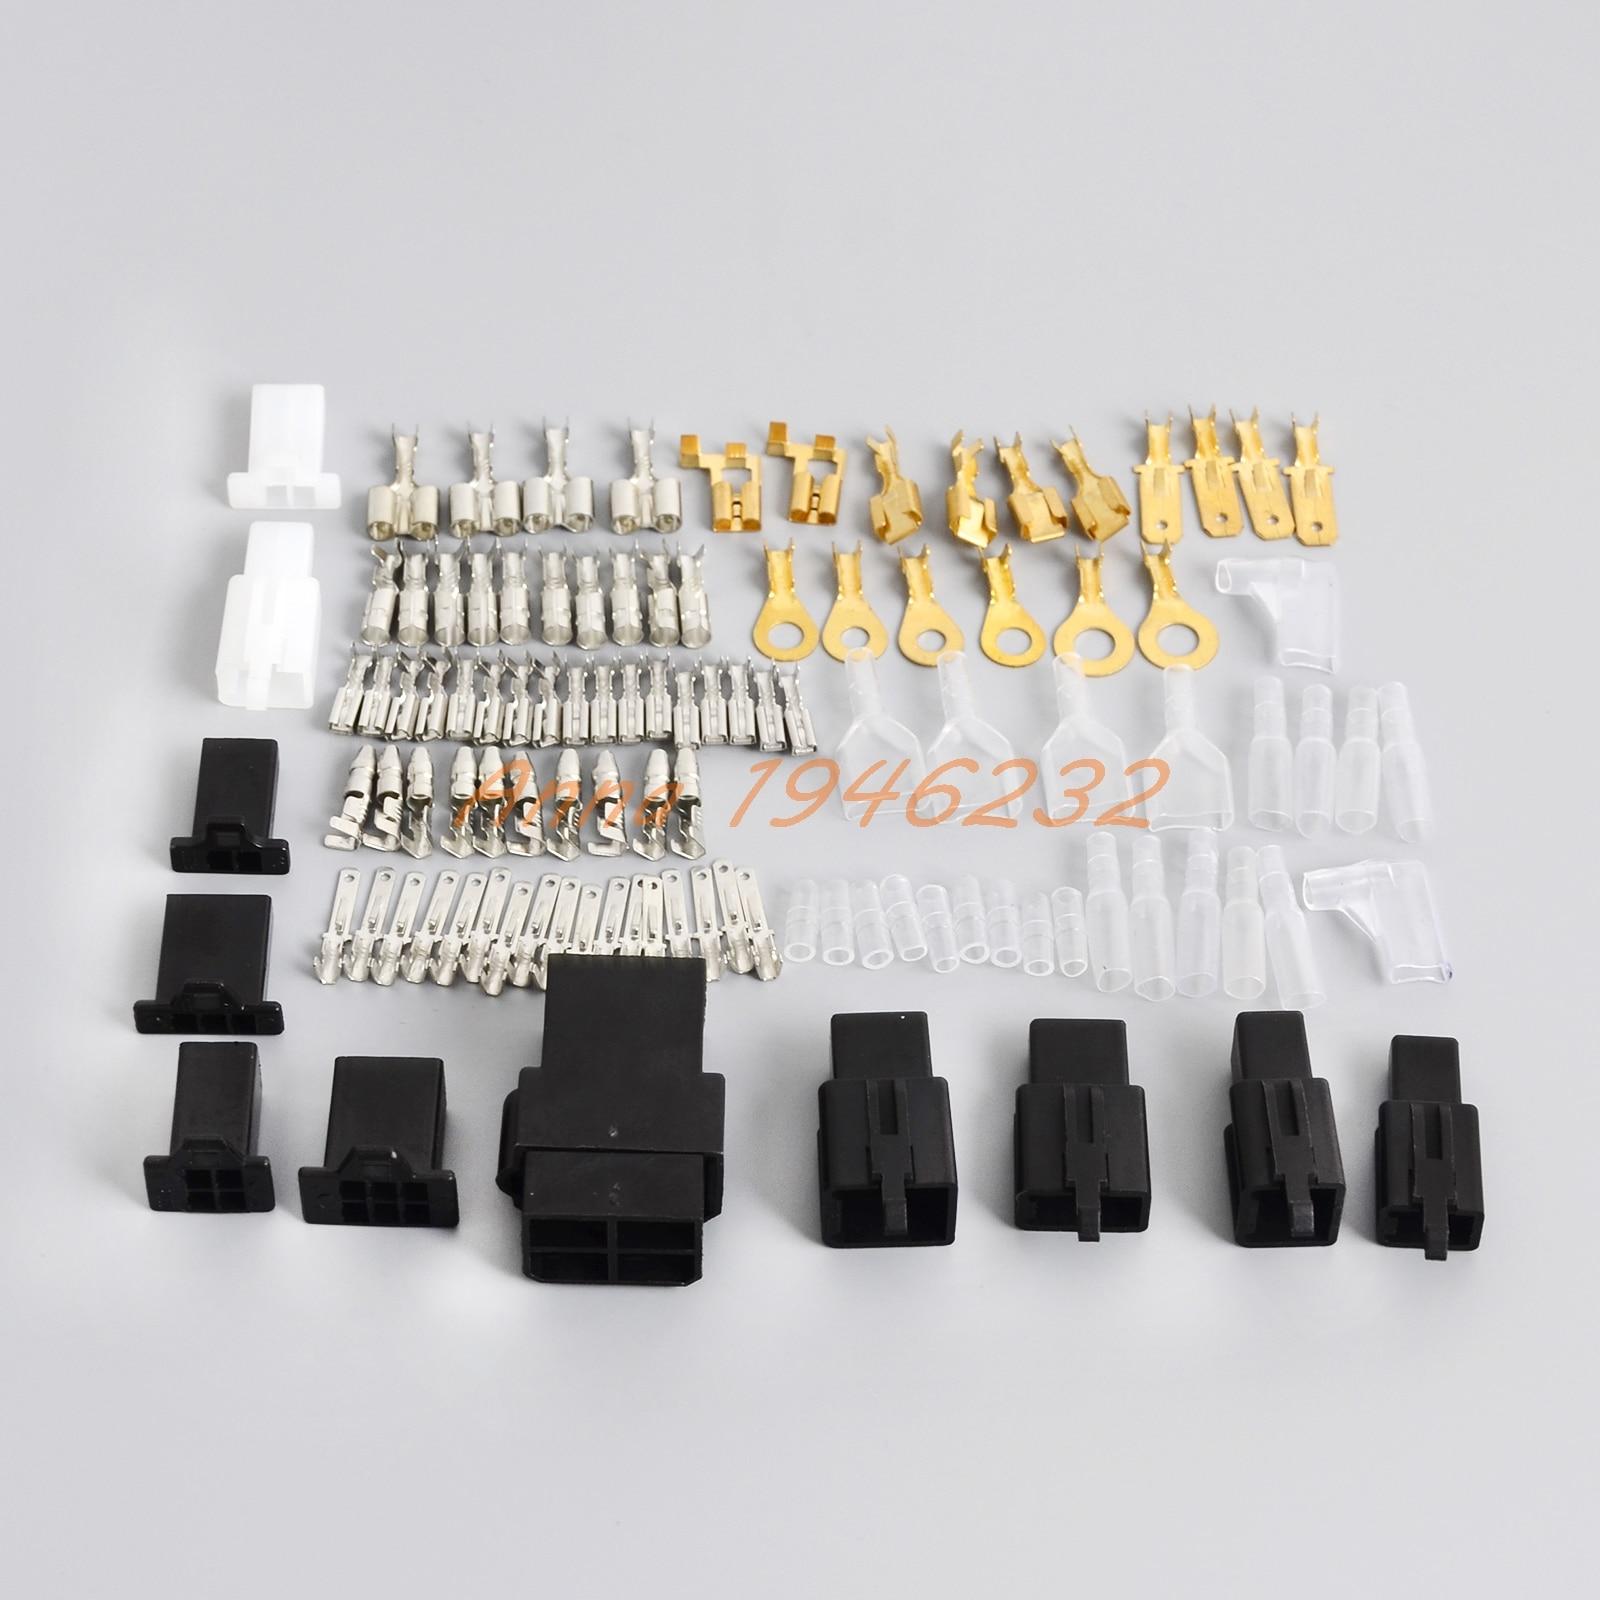 Cb125s Wiring Harness Library Honda 125 For1987 Cdi Box Diagram Electrical Loom Repair Kit Plugs Bullets For Nc50 Cb500 Cbr250 Vf750 Cb125 Cb250